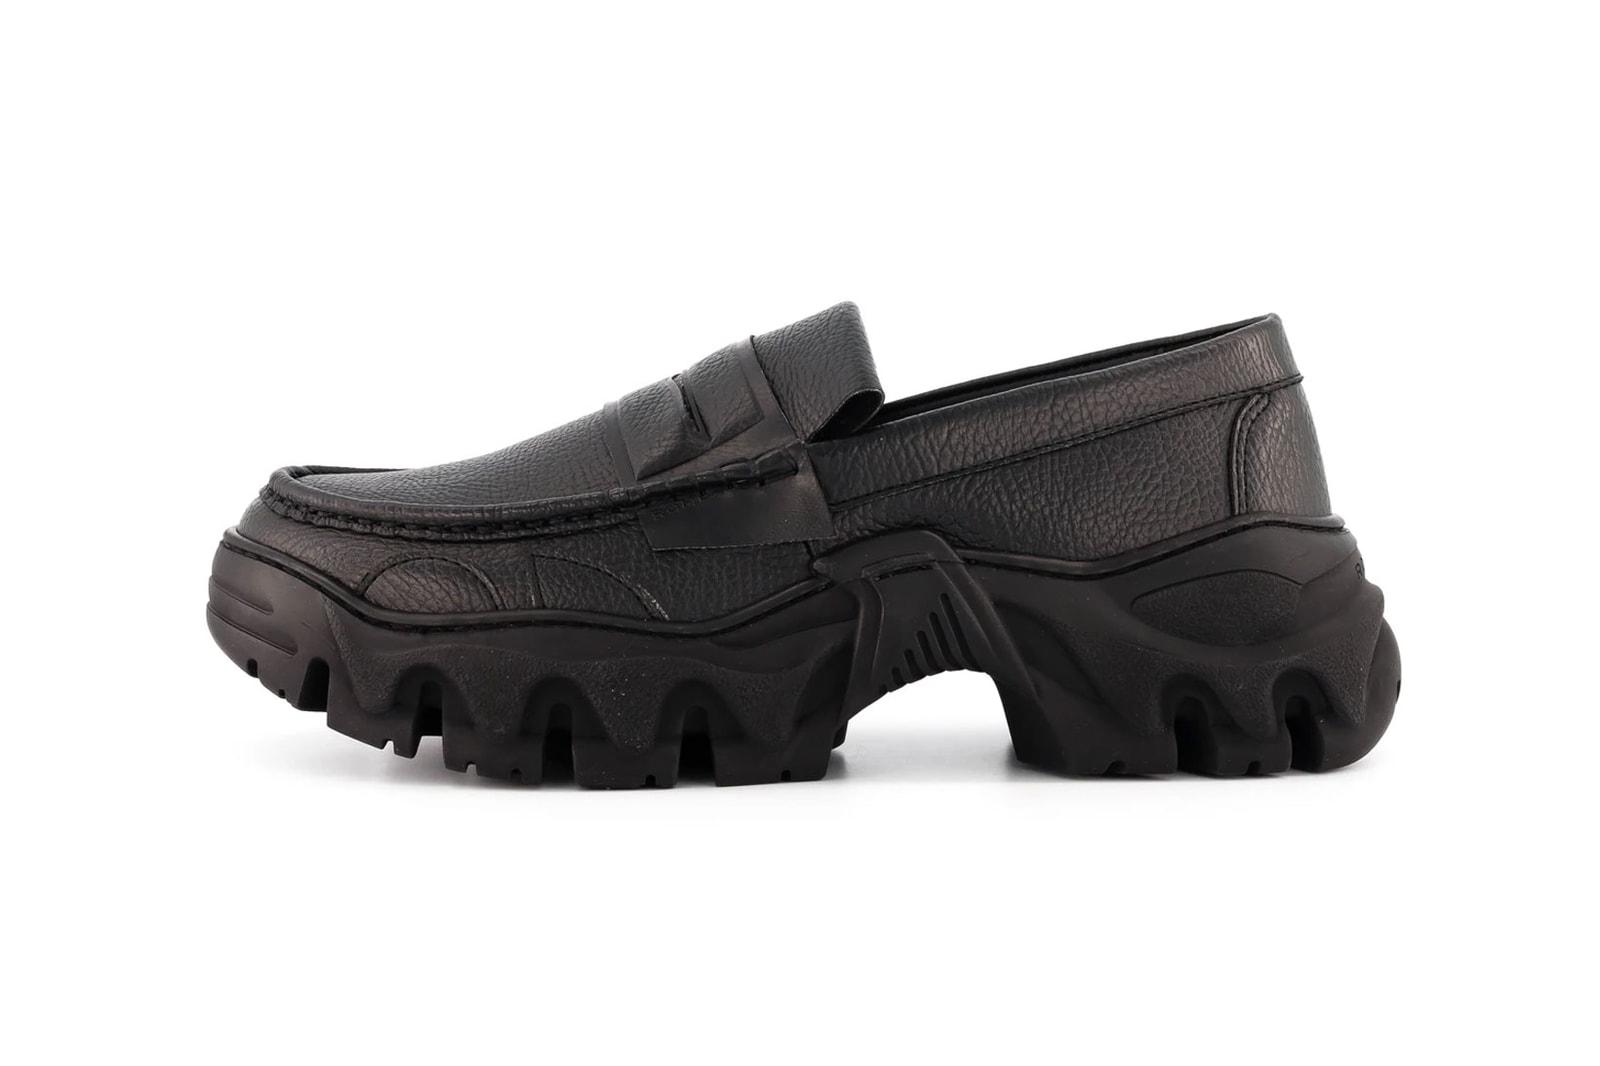 best vegan shoes fall winter sneakers boots loafers derbies veja dr martens adidas originals